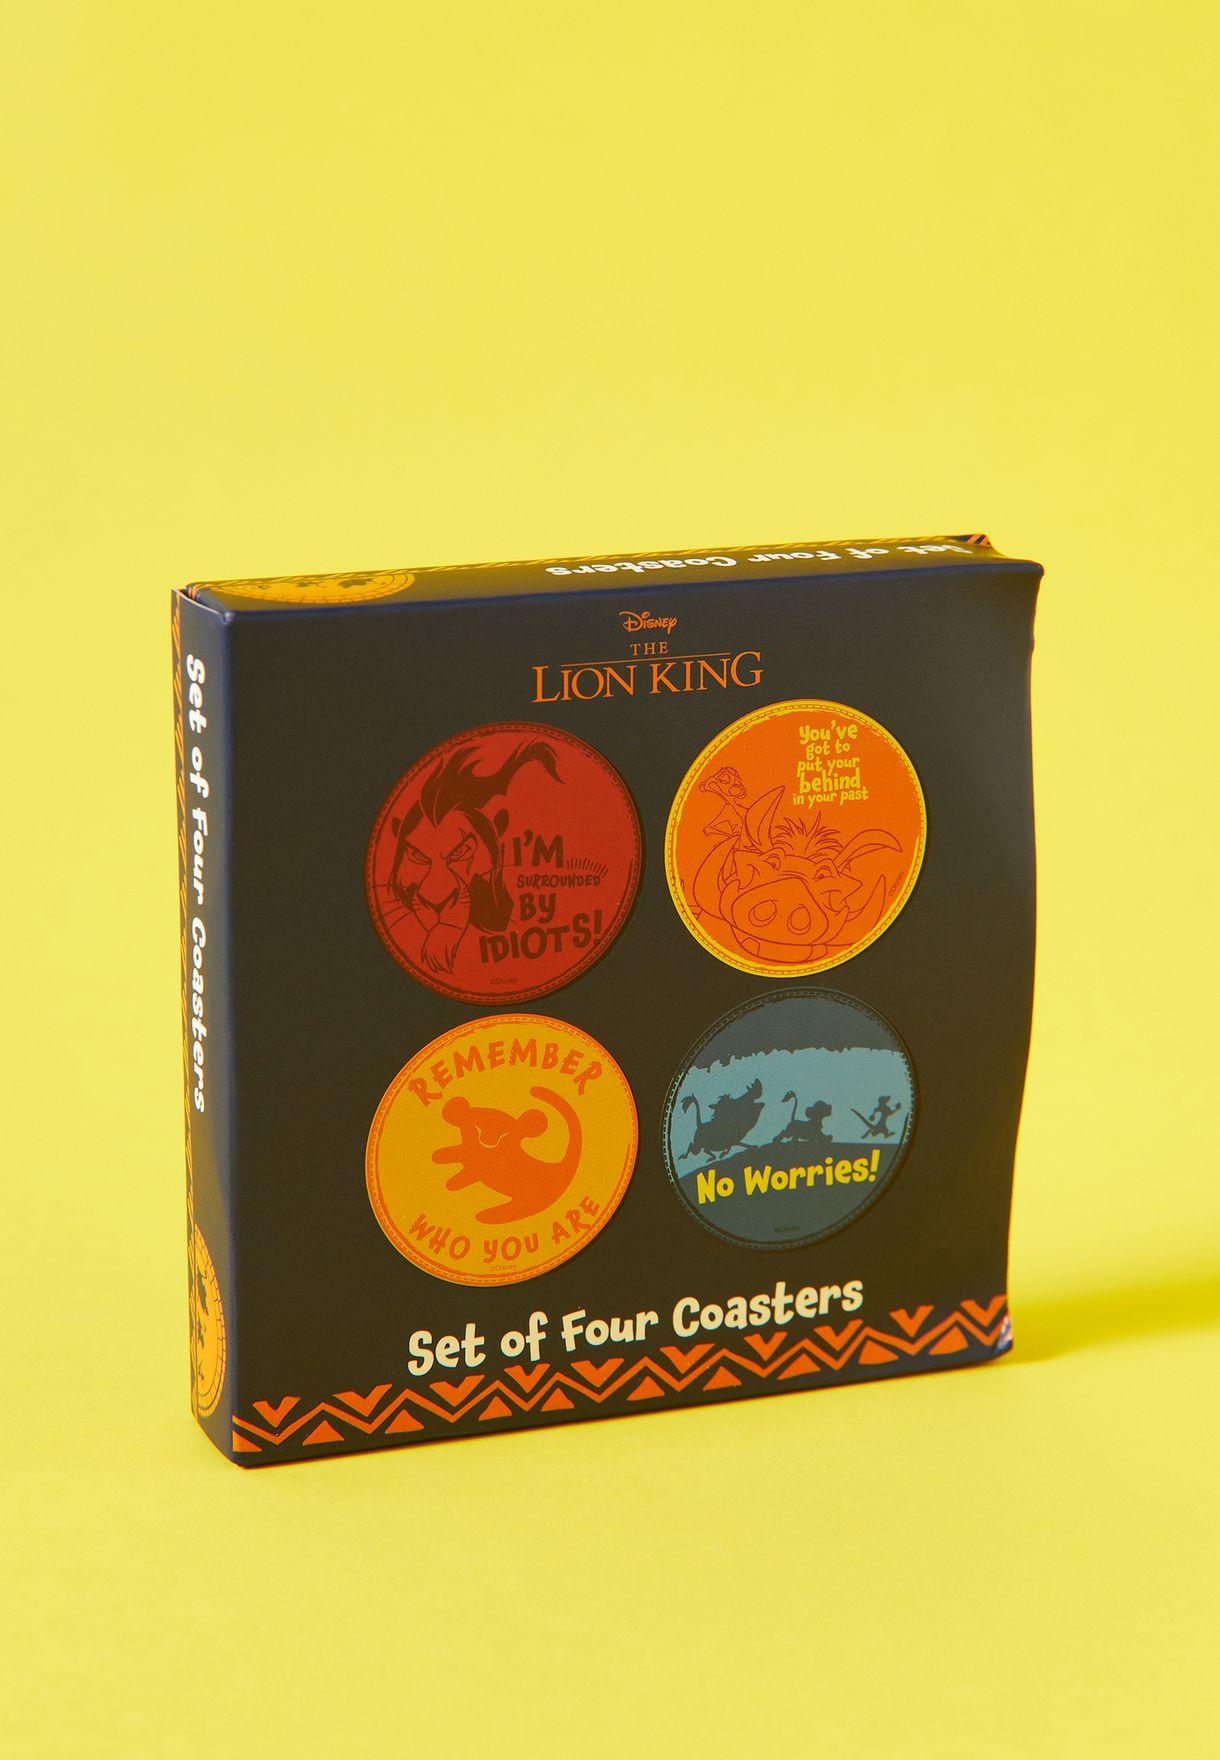 Disney The Lion King Set of 4 Coasters